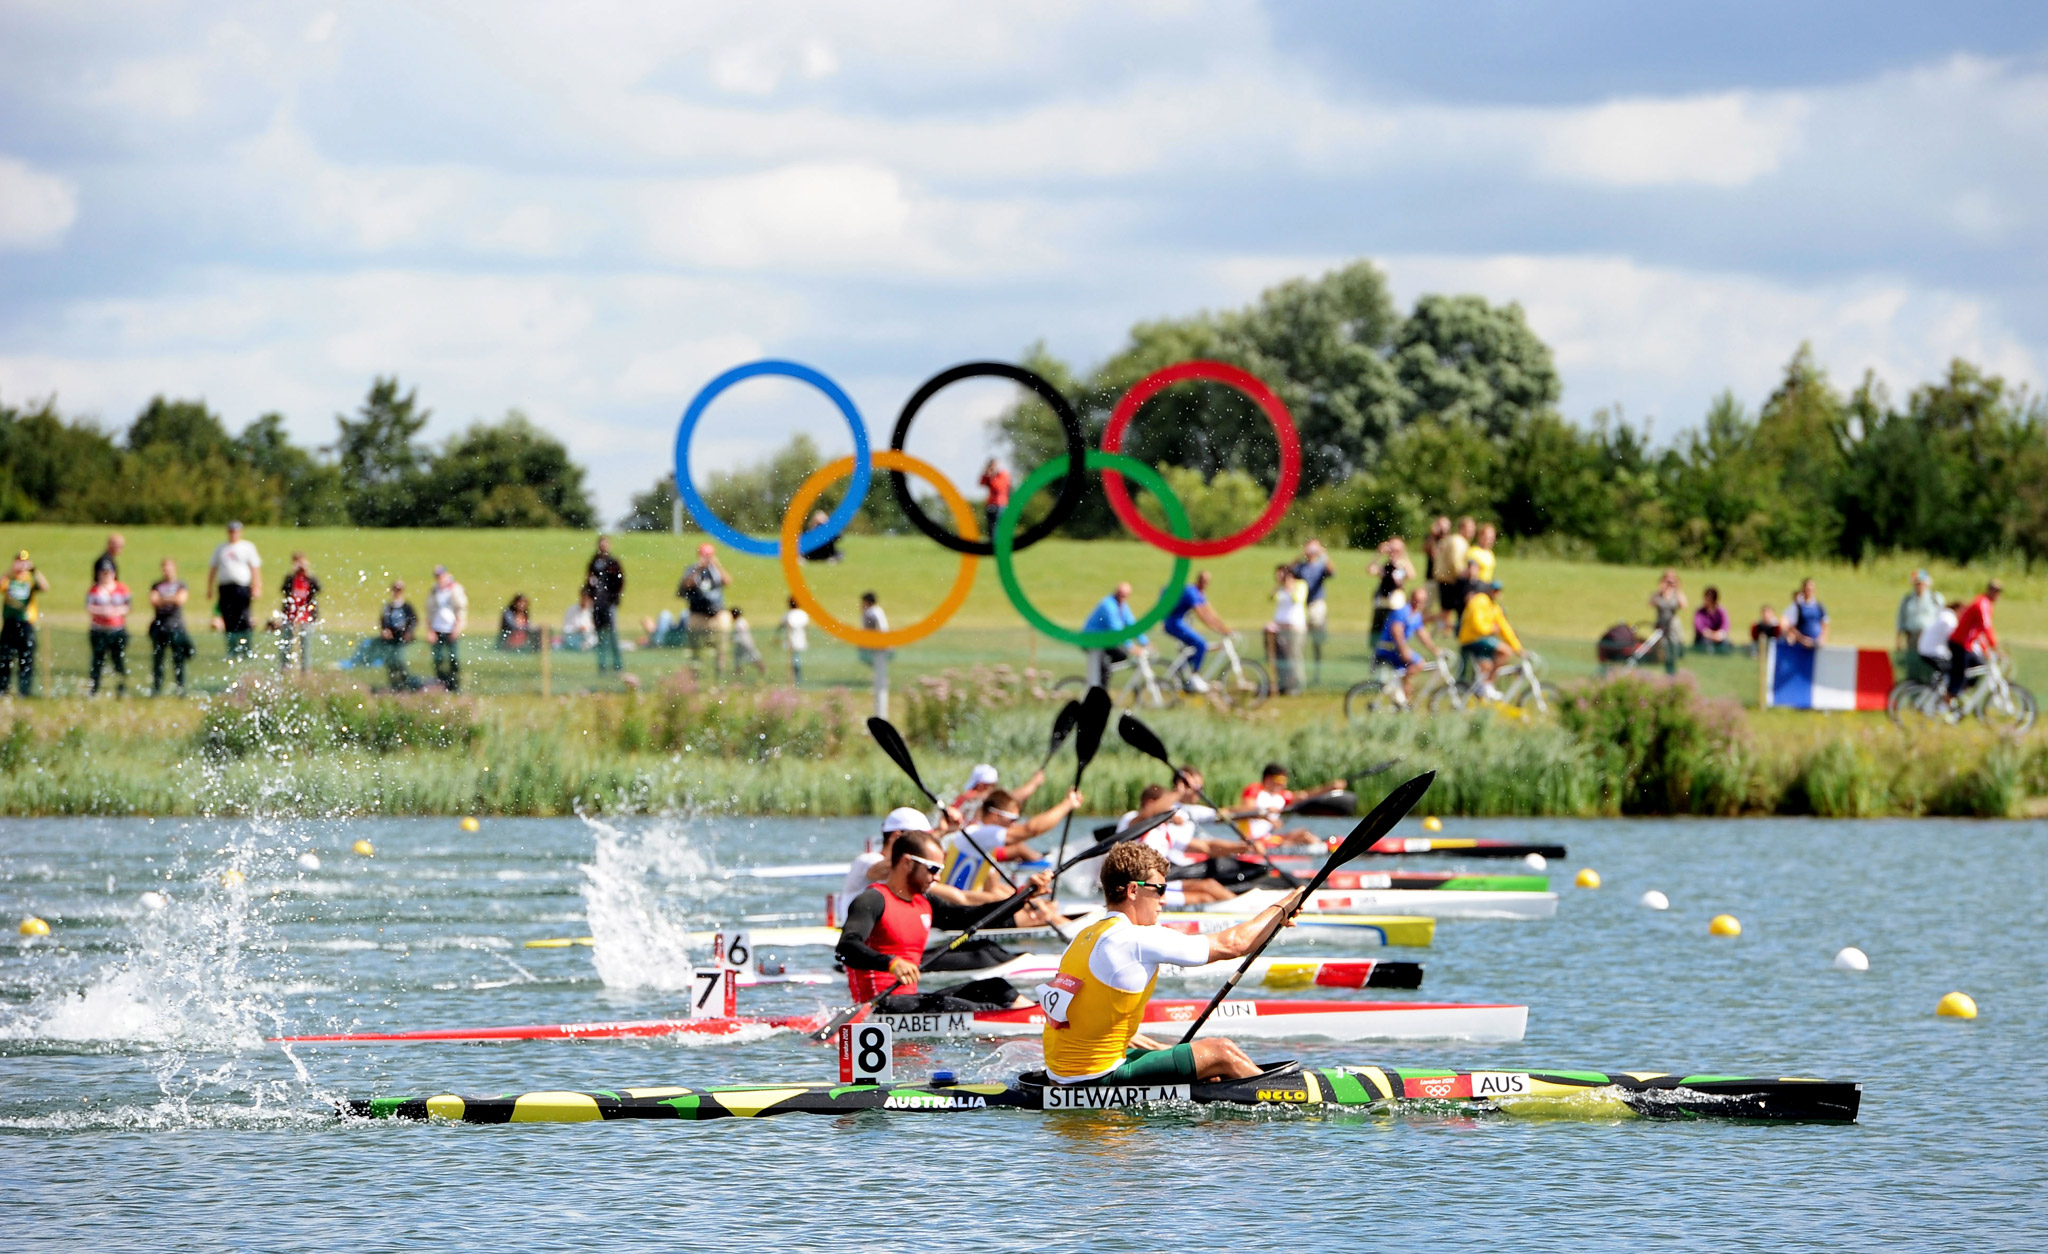 1000m Canoe Sprint semifinal